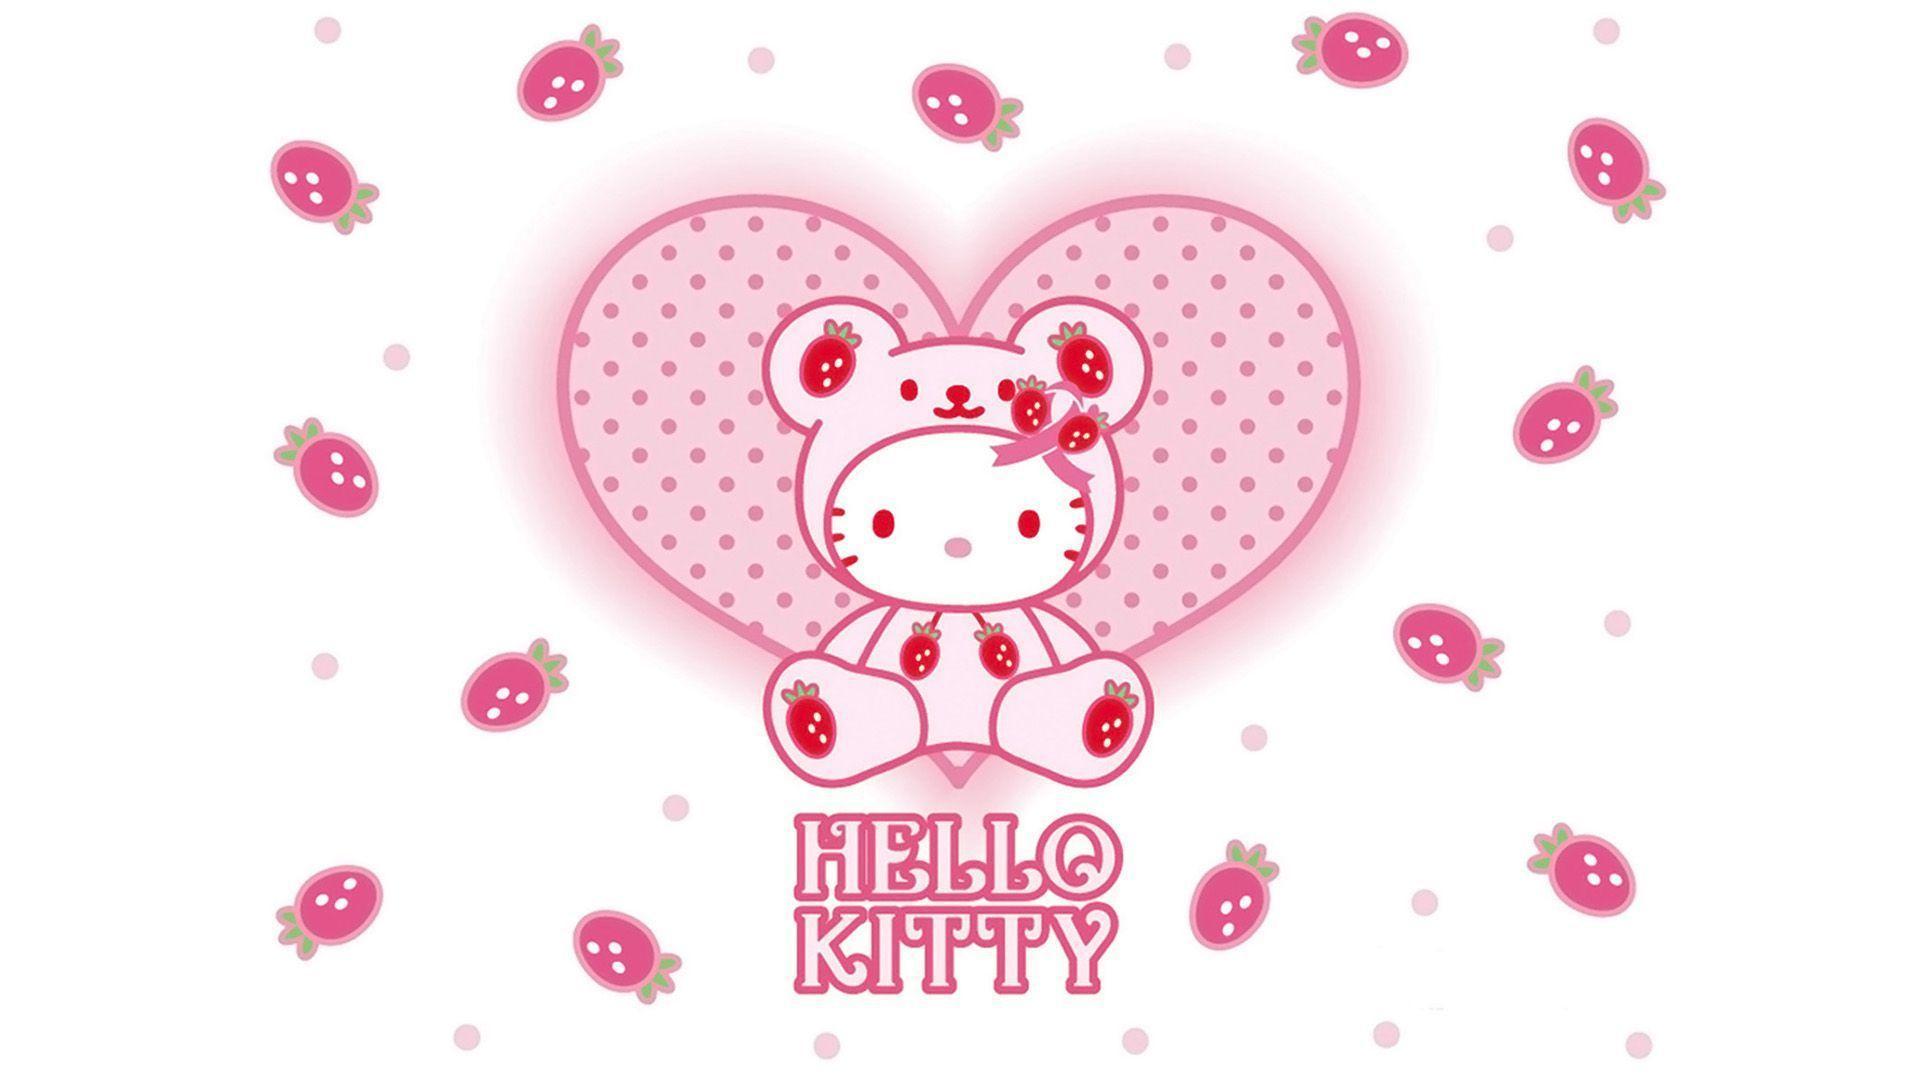 cute pink hello kitty wallpaper - photo #48